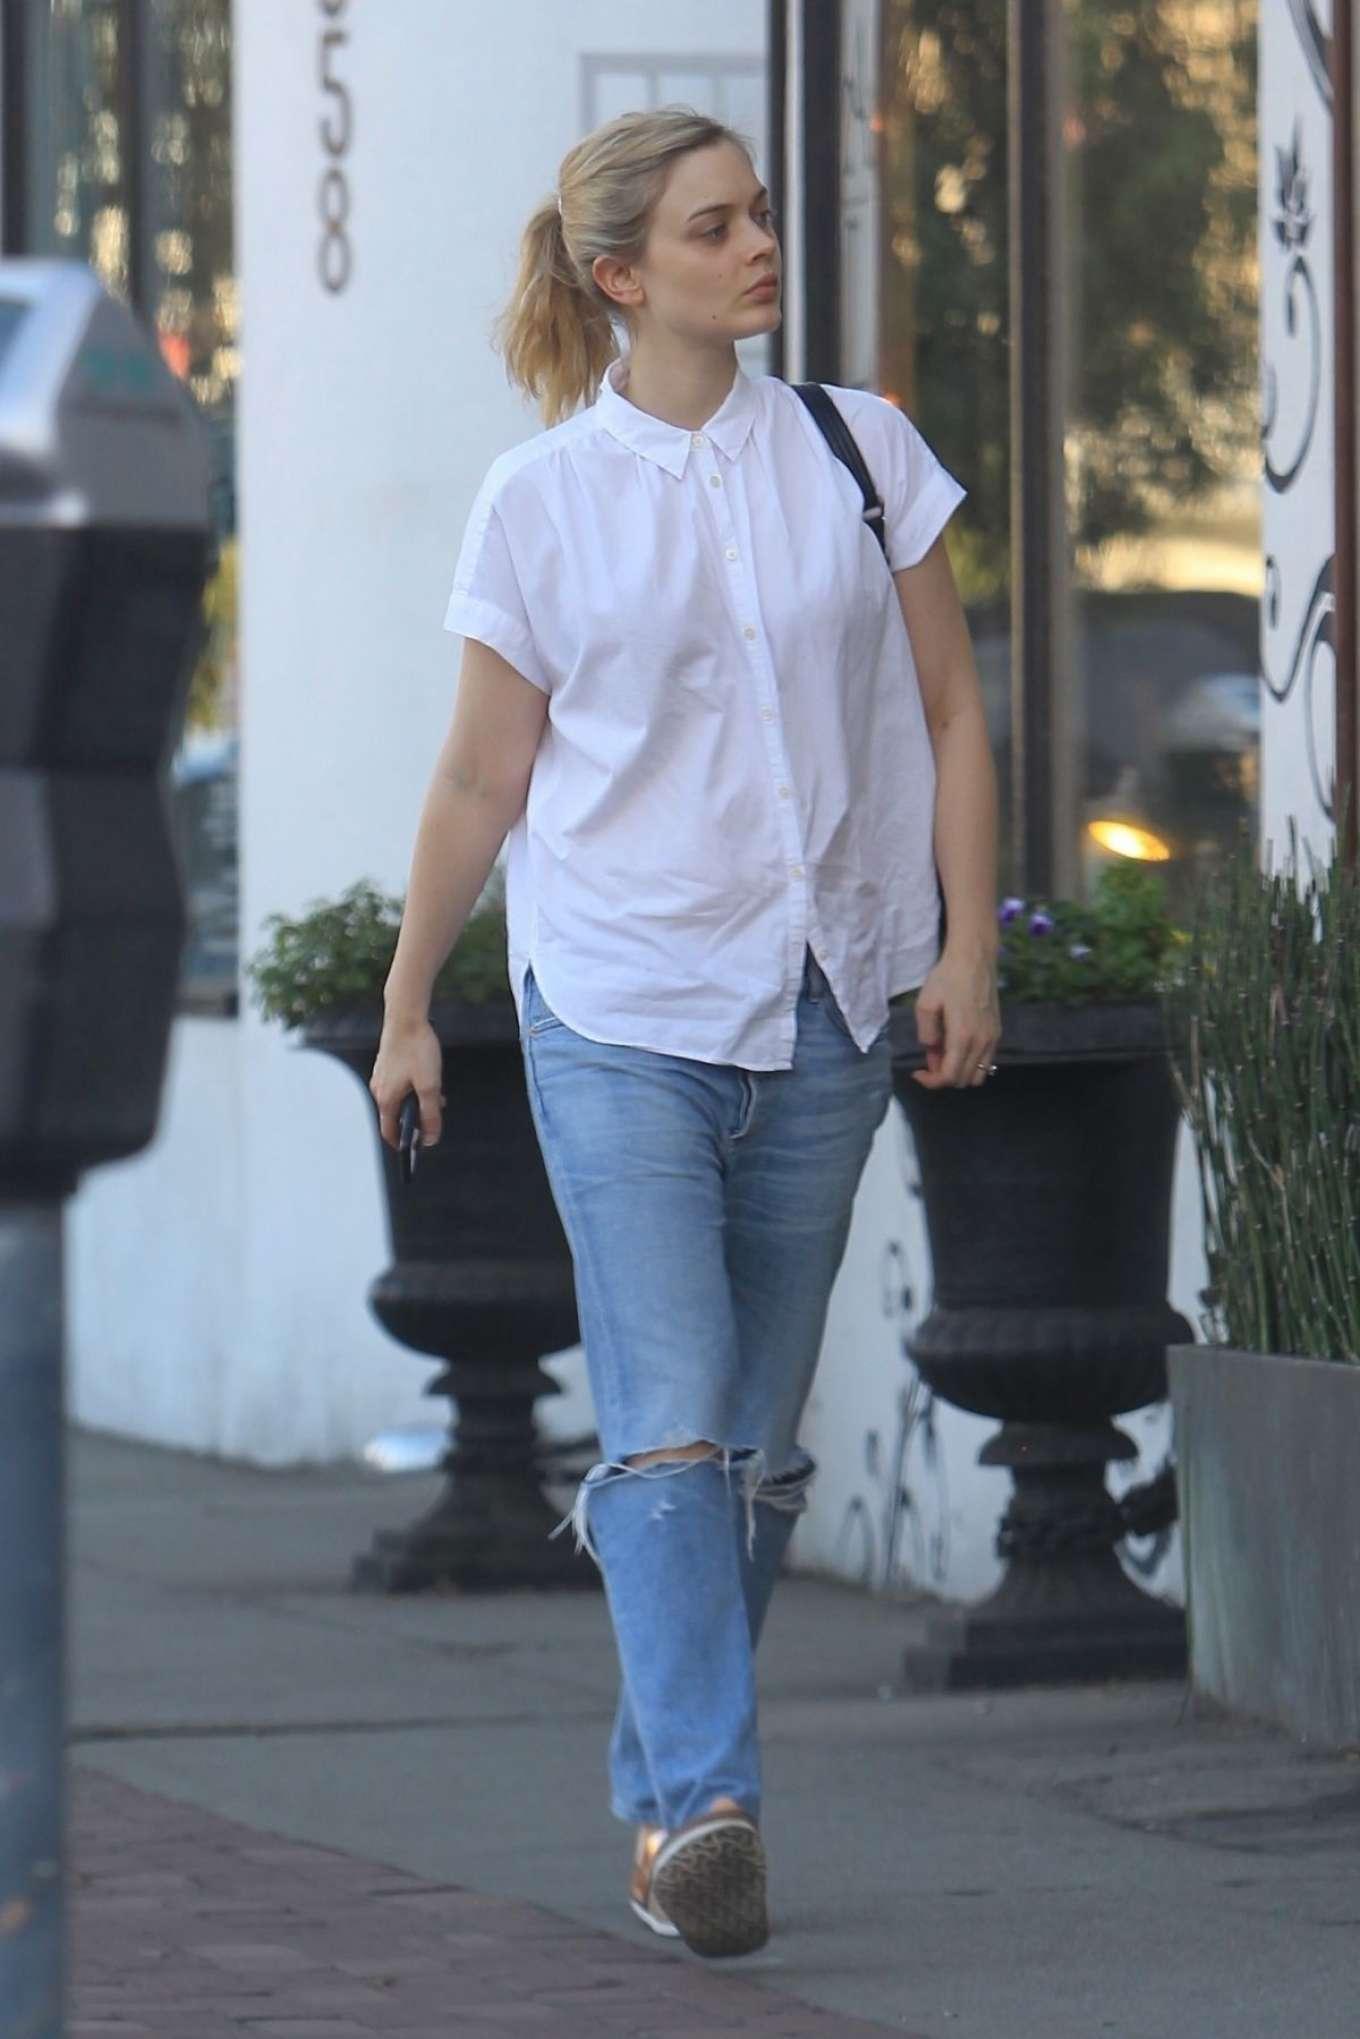 Bella Heathcote 2017 : Bella Heathcote in Jeans -03